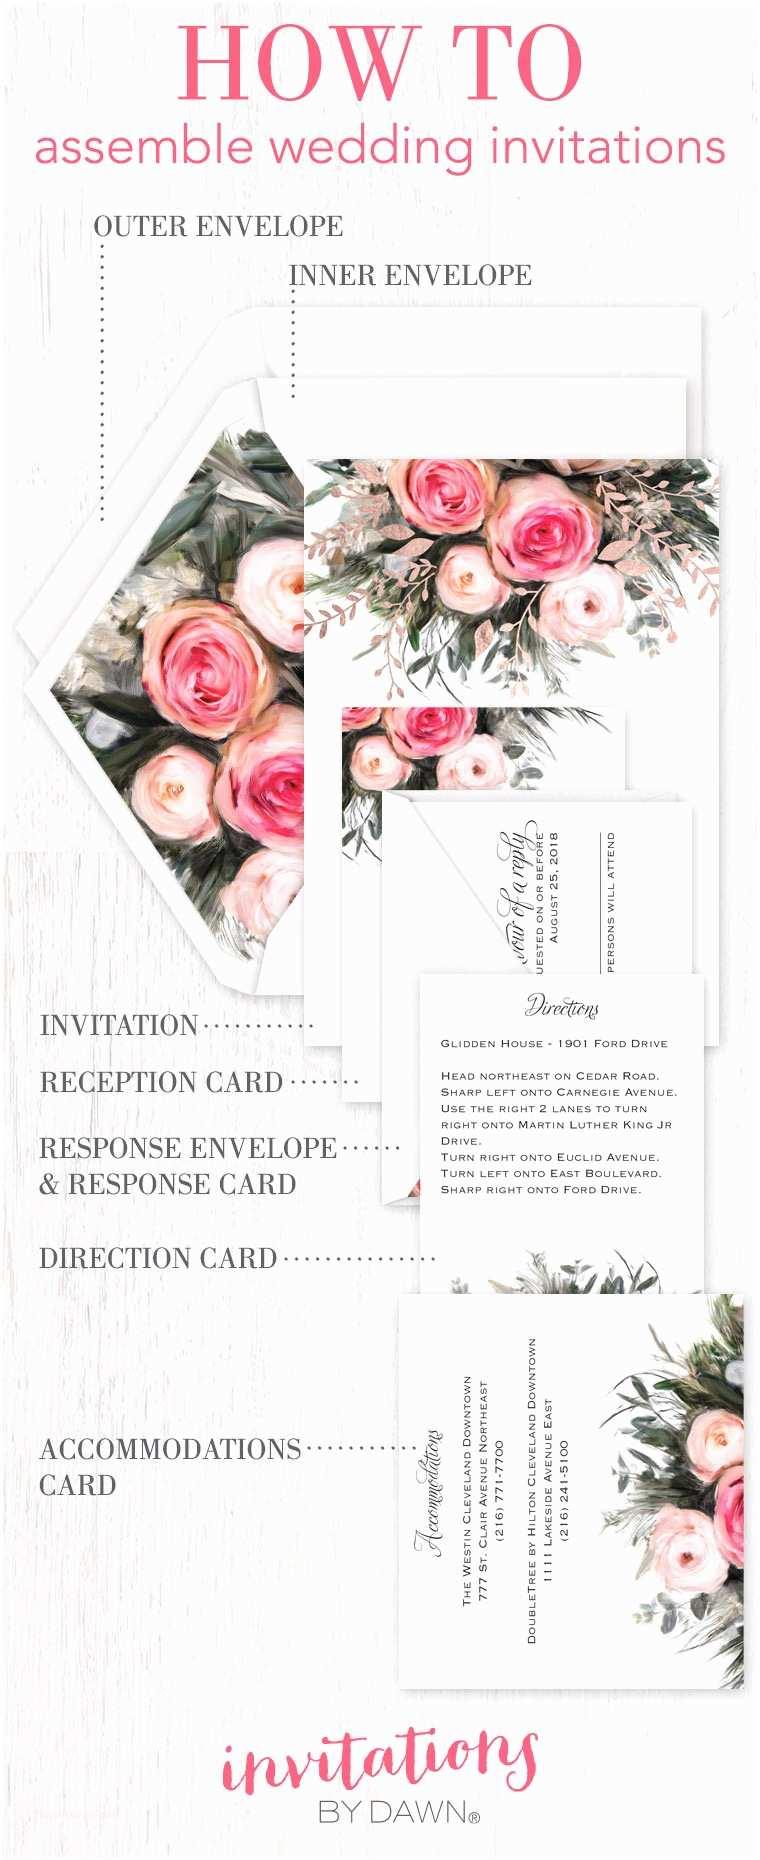 Wedding Invitations by Dawn assembling Wedding Invitations